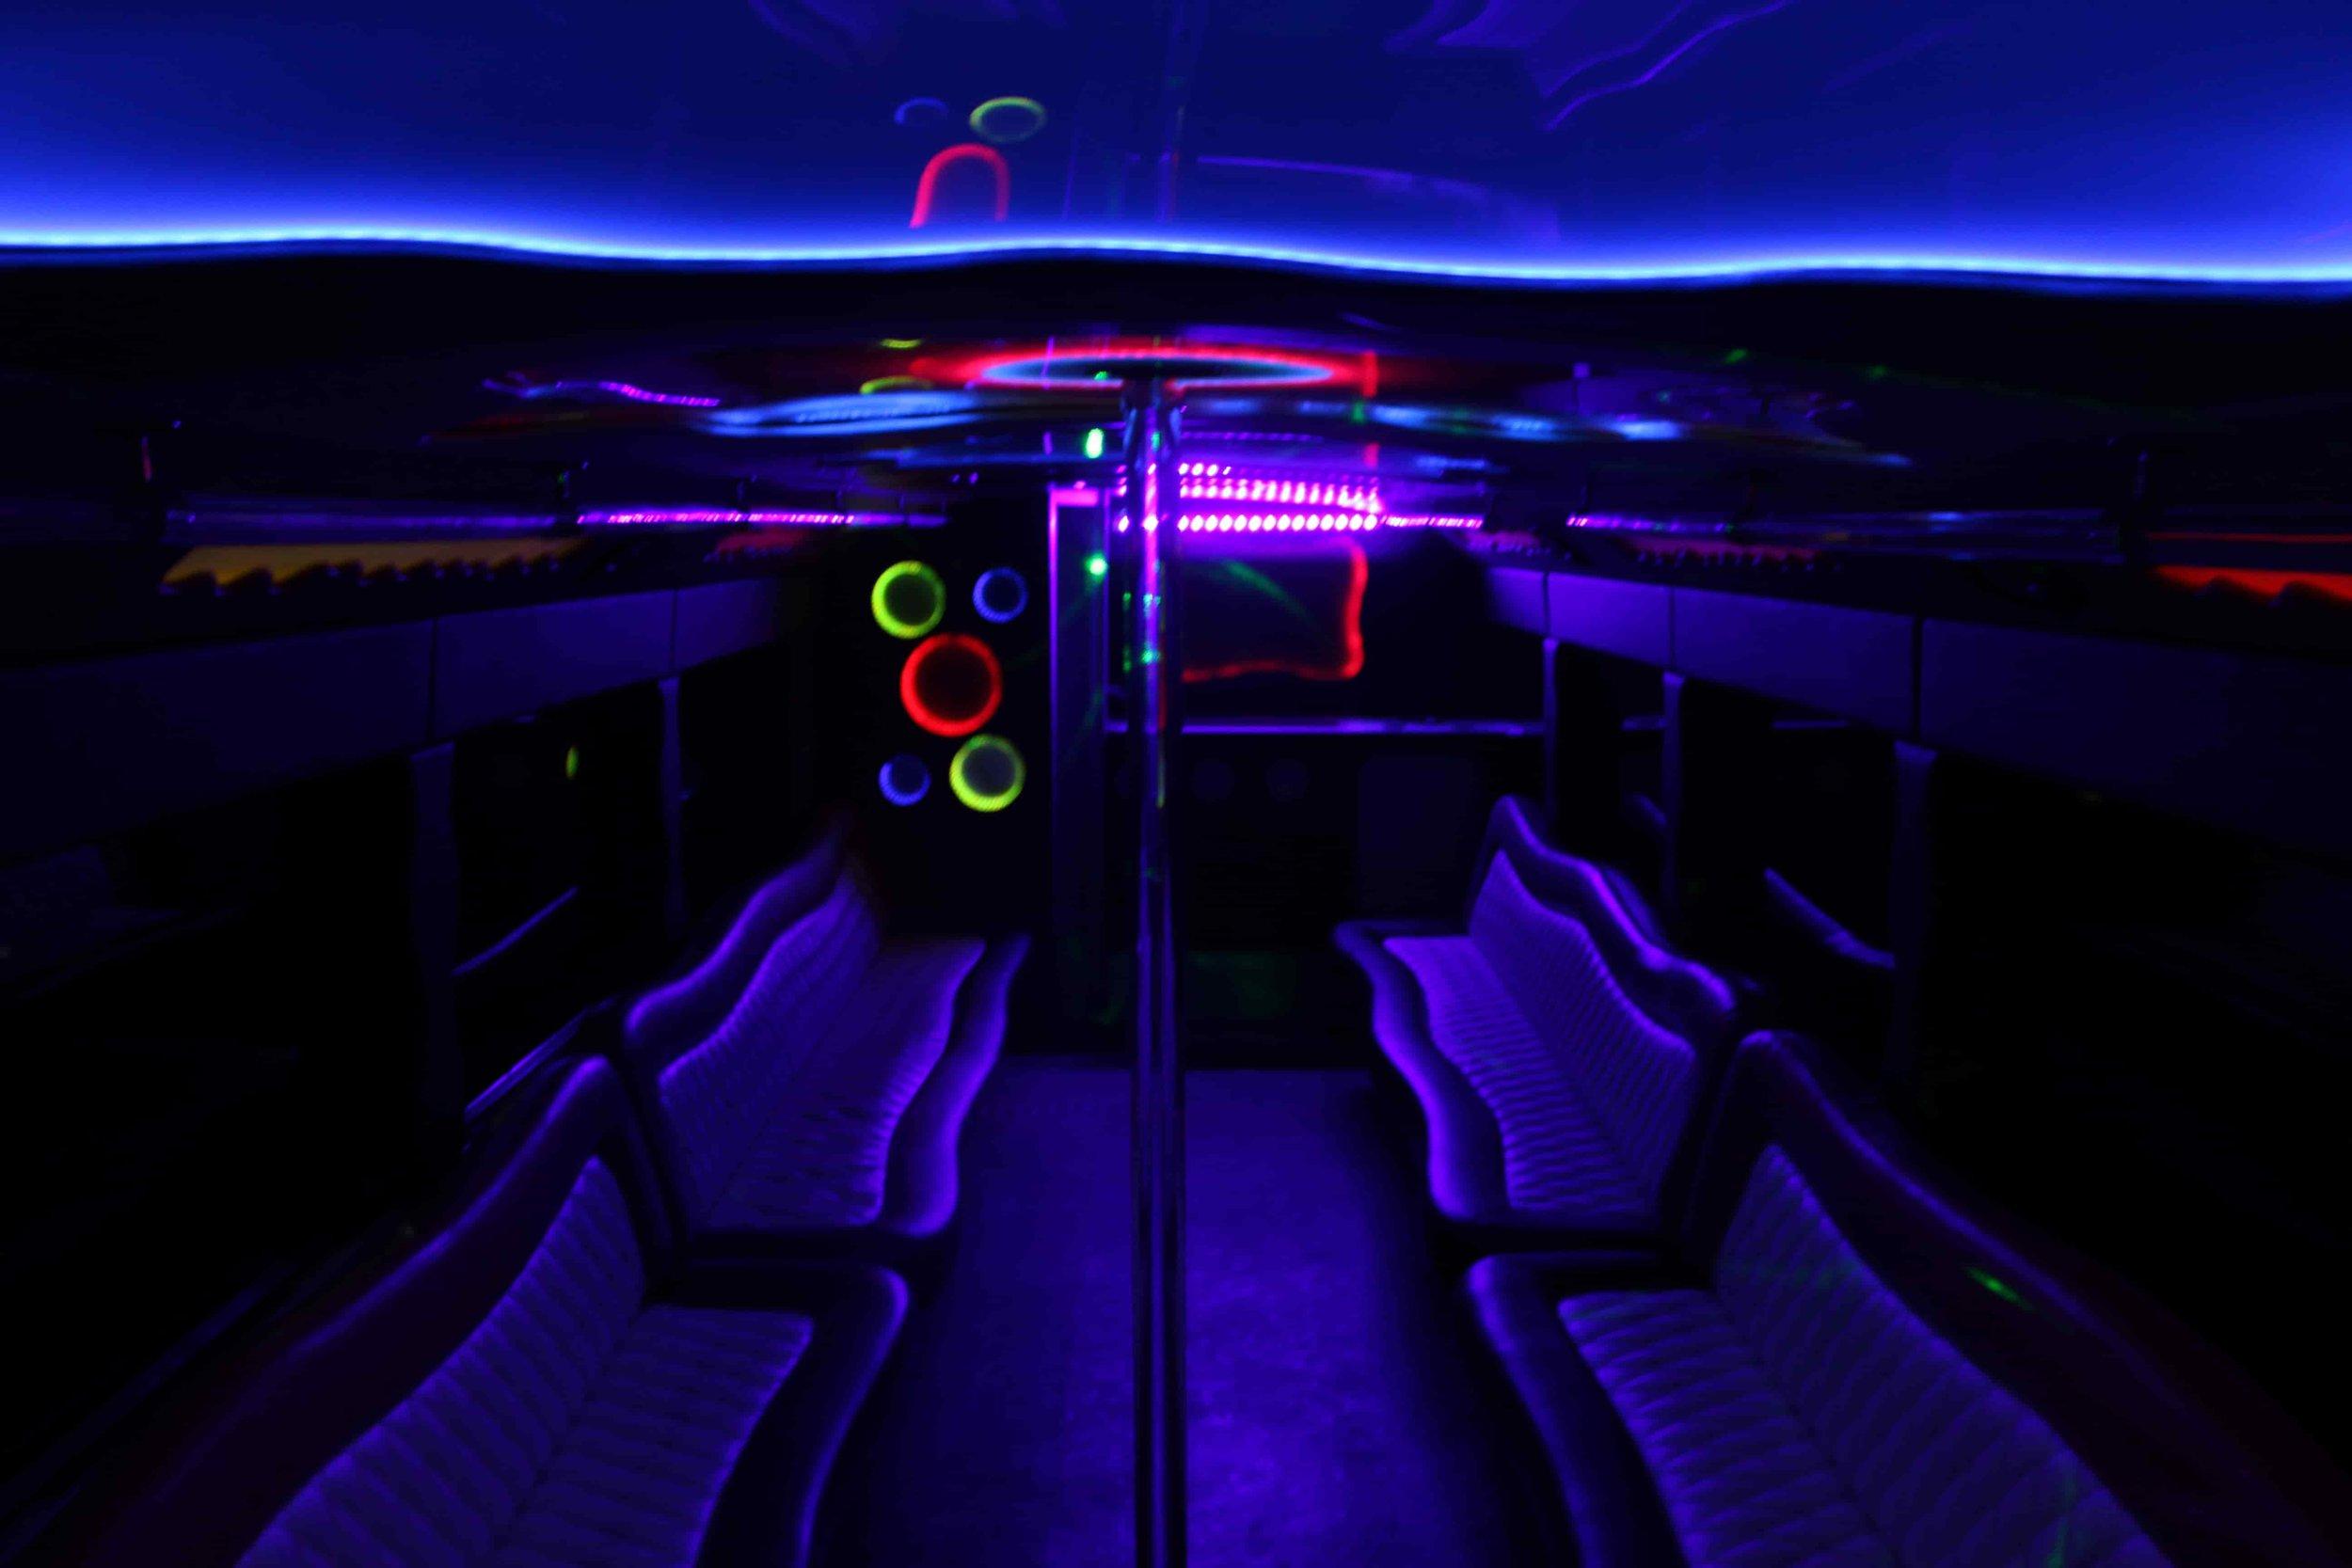 Patriot Limo Bus with a dark light glow